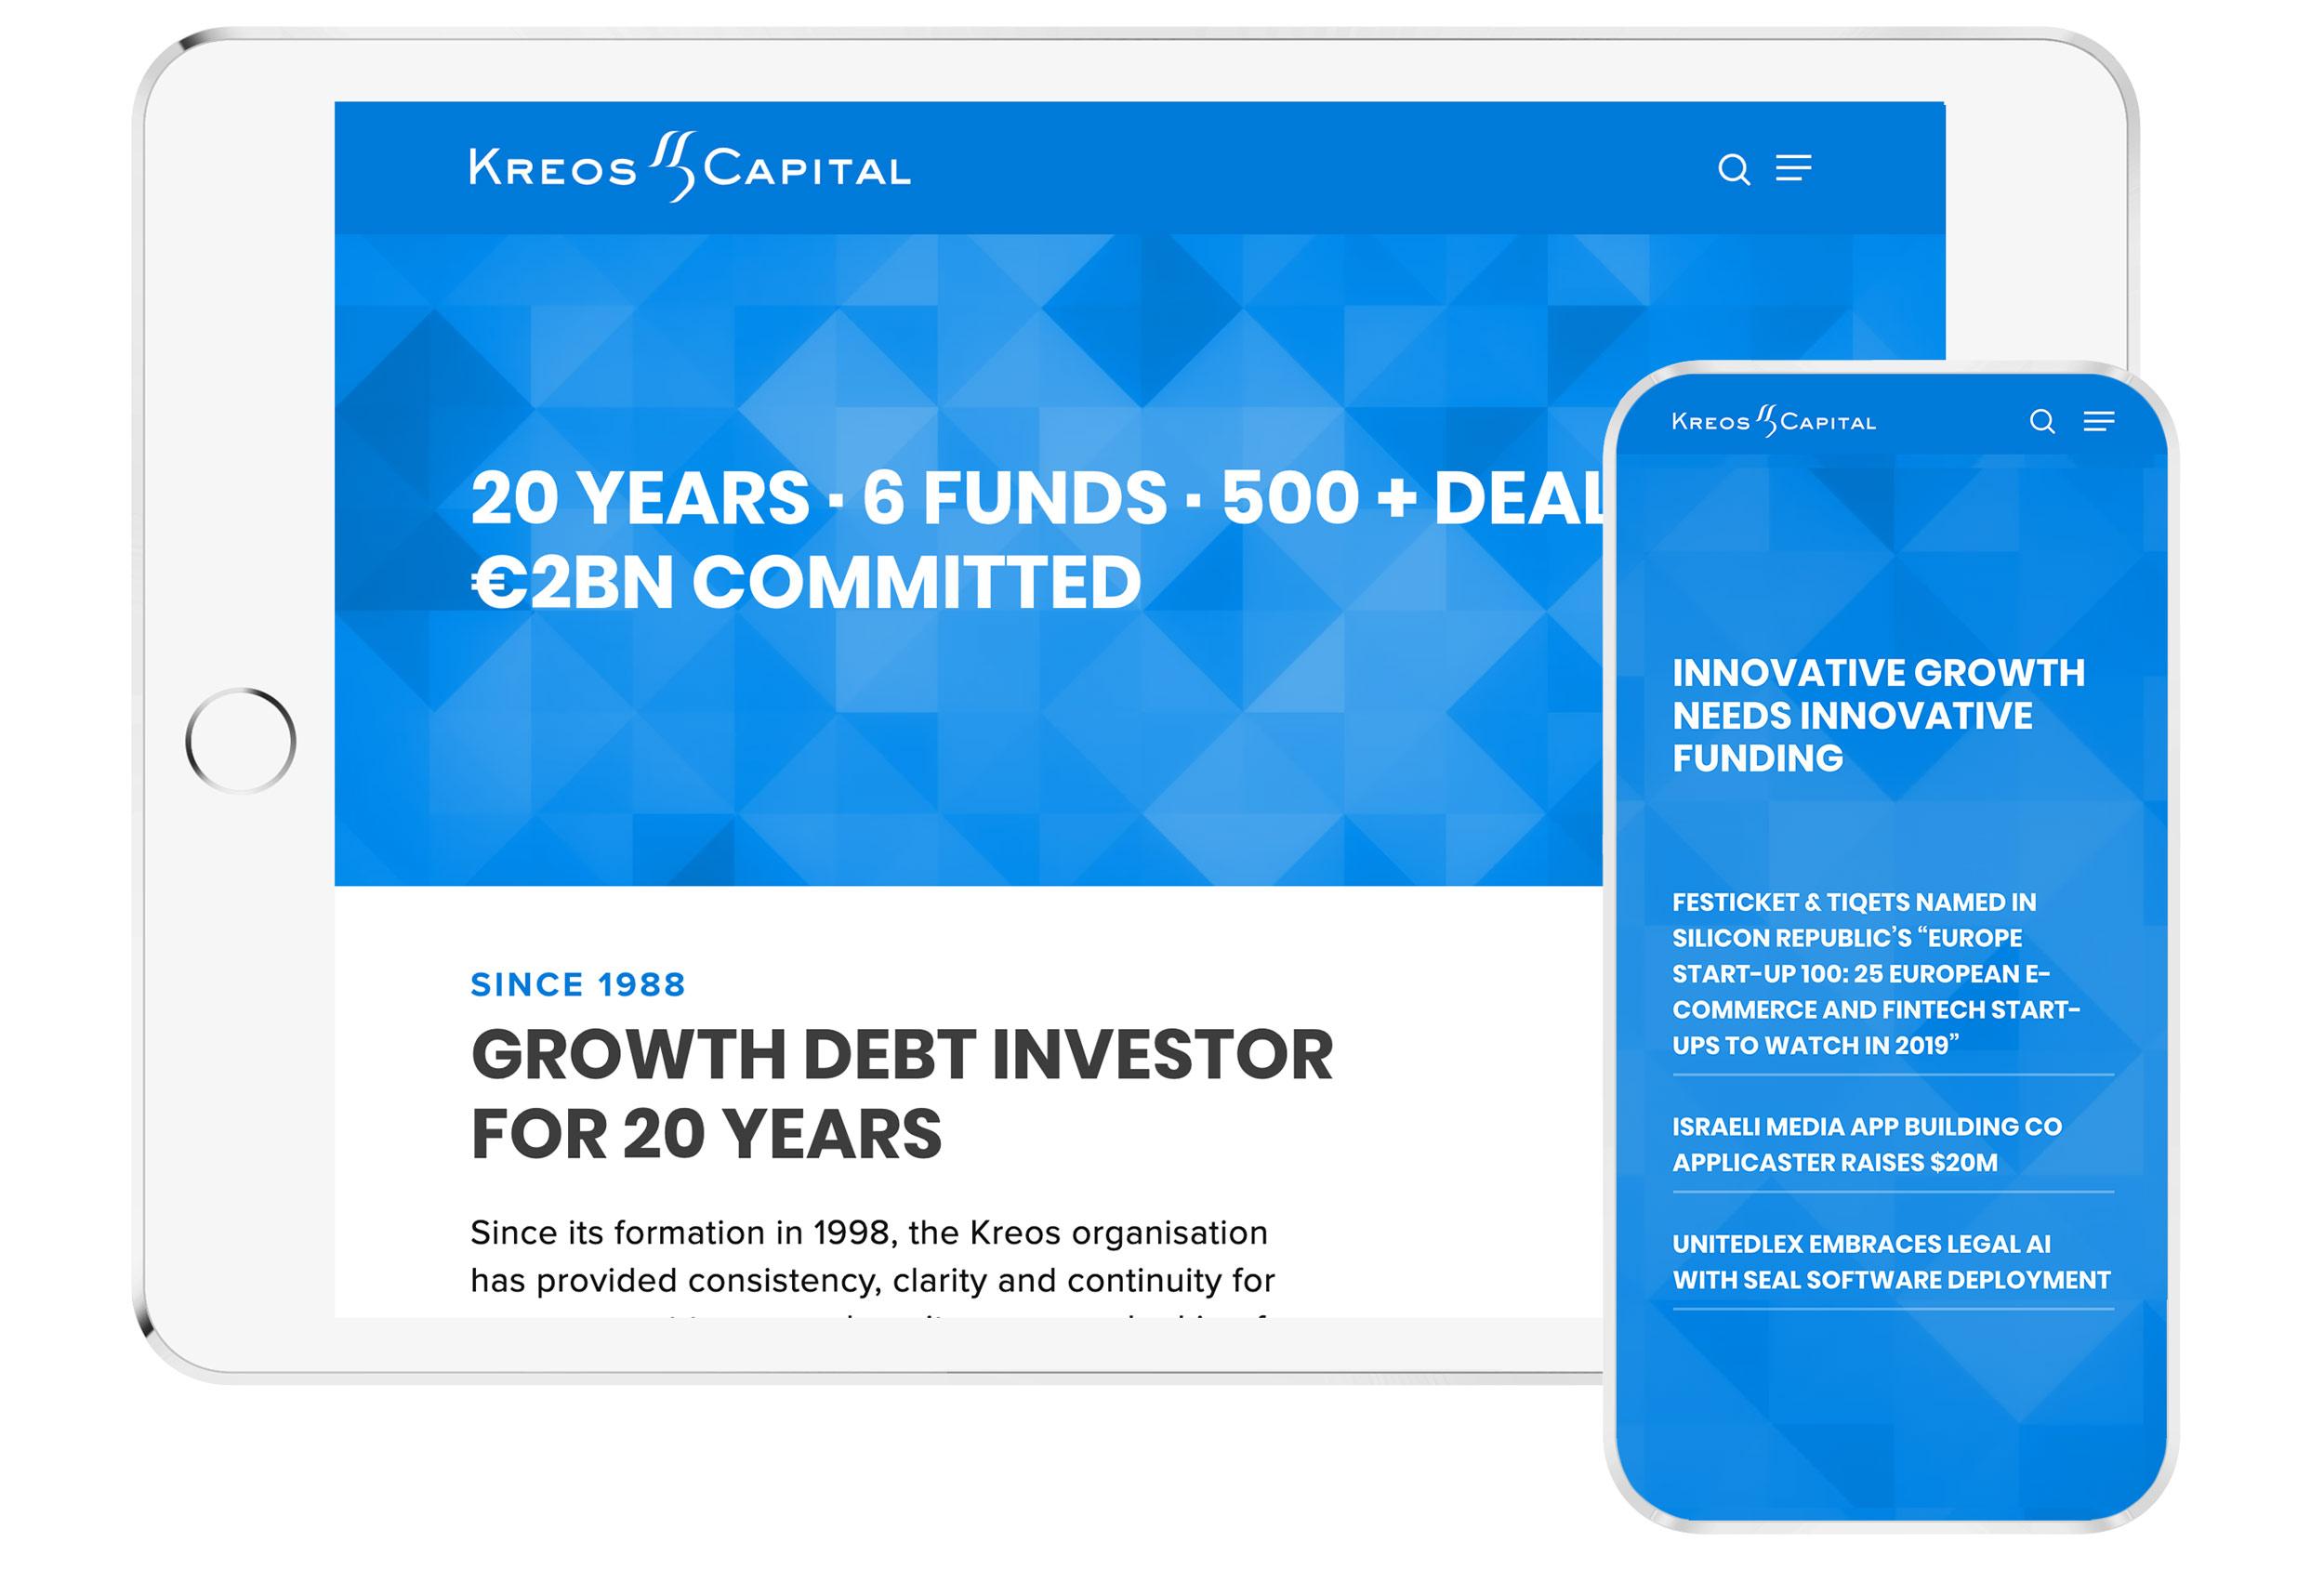 kreos iphone and ipad mockup financial company